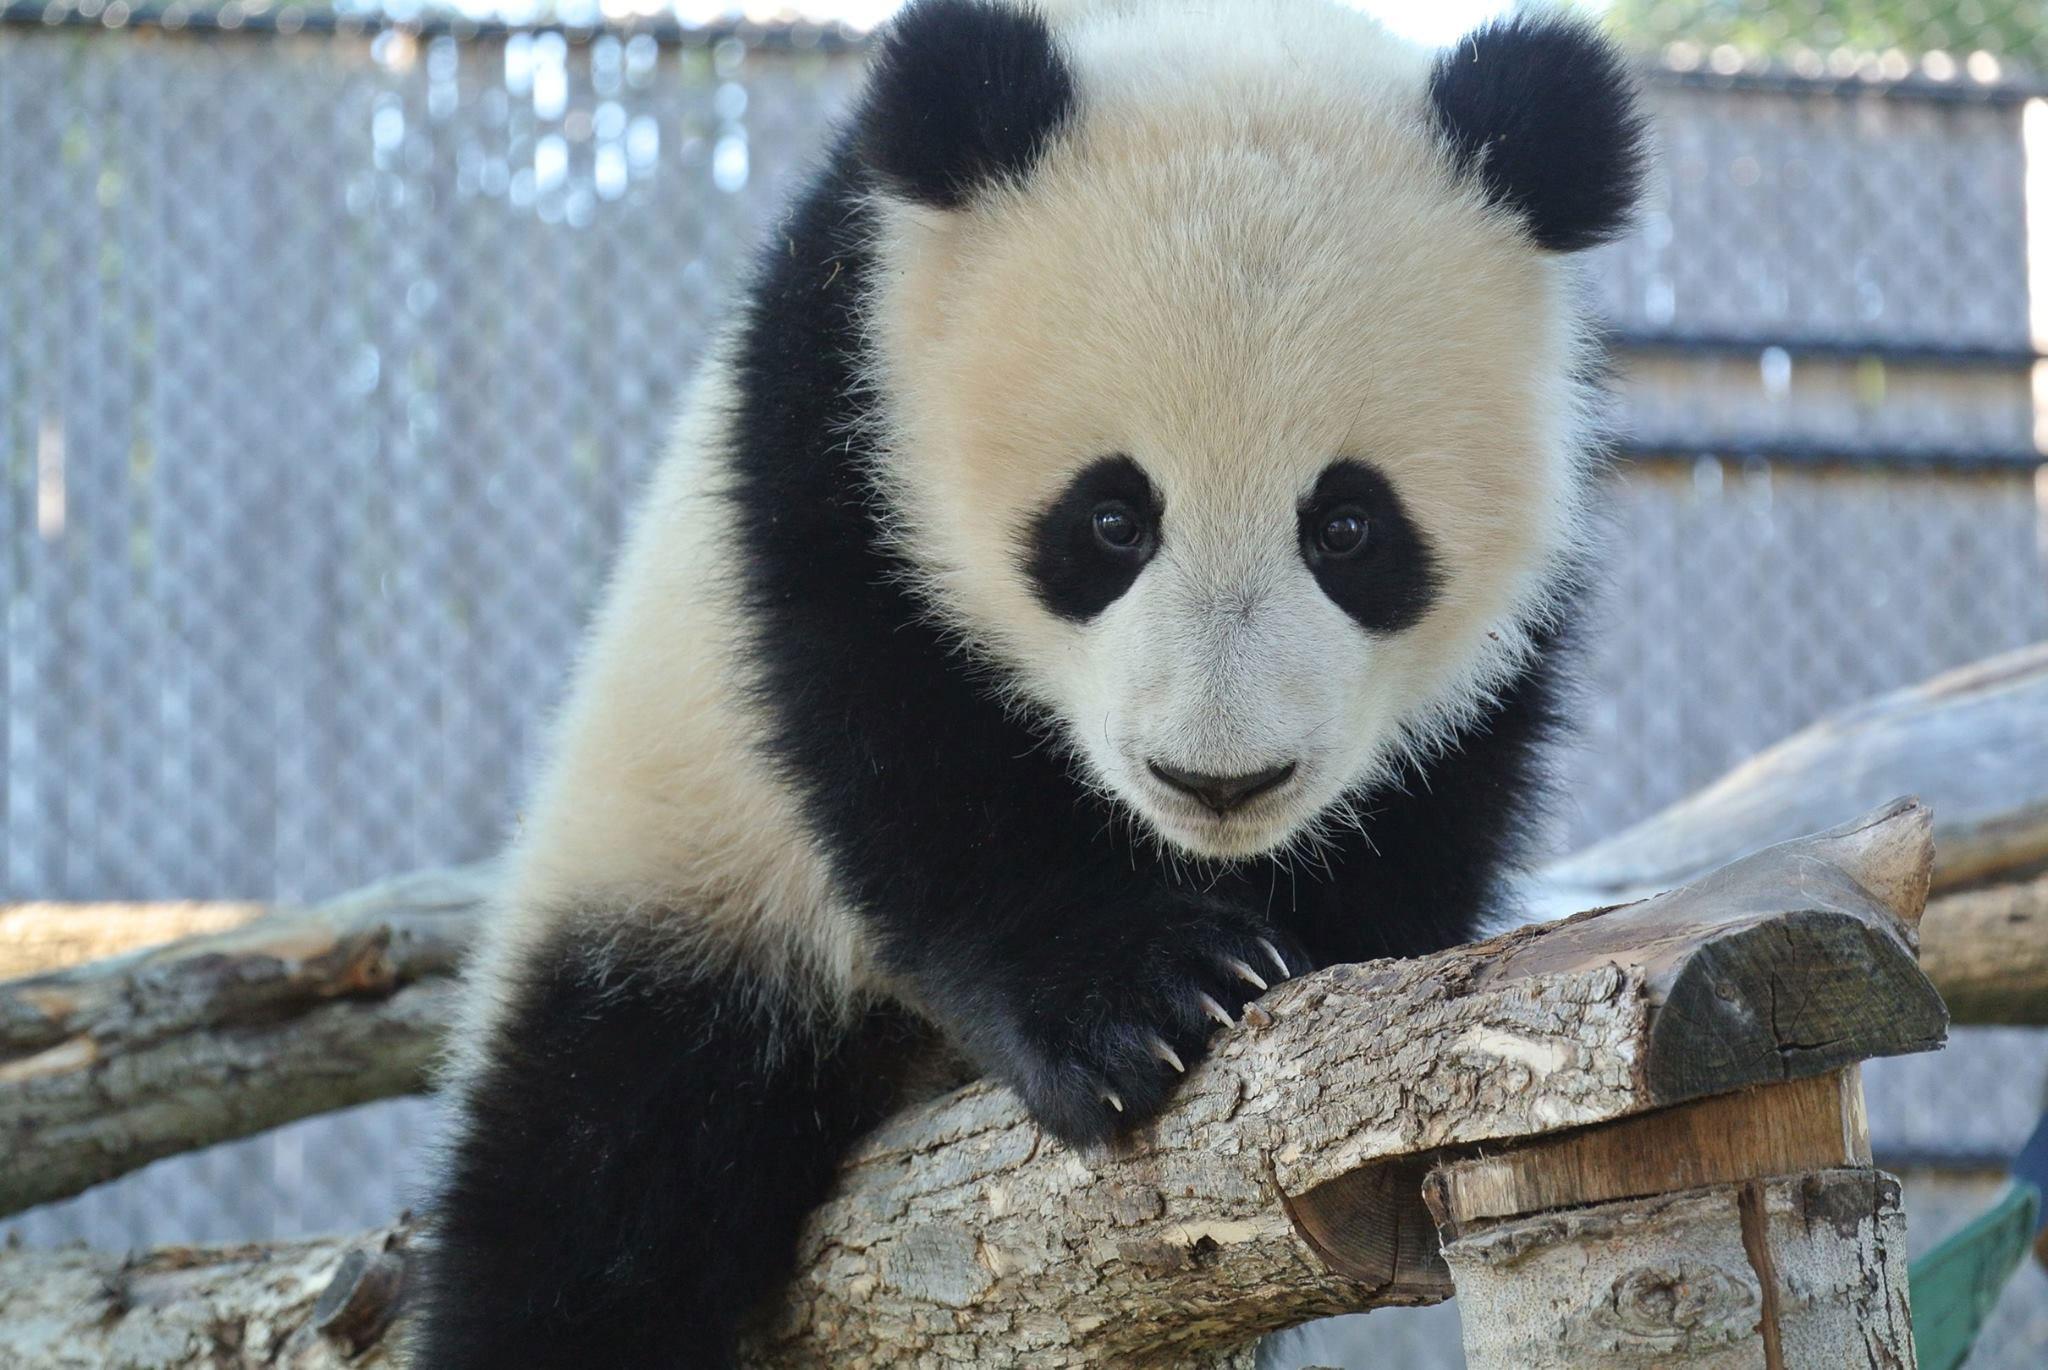 At Eight Months Old, Toronto Zoo Panda Cubs Starting To